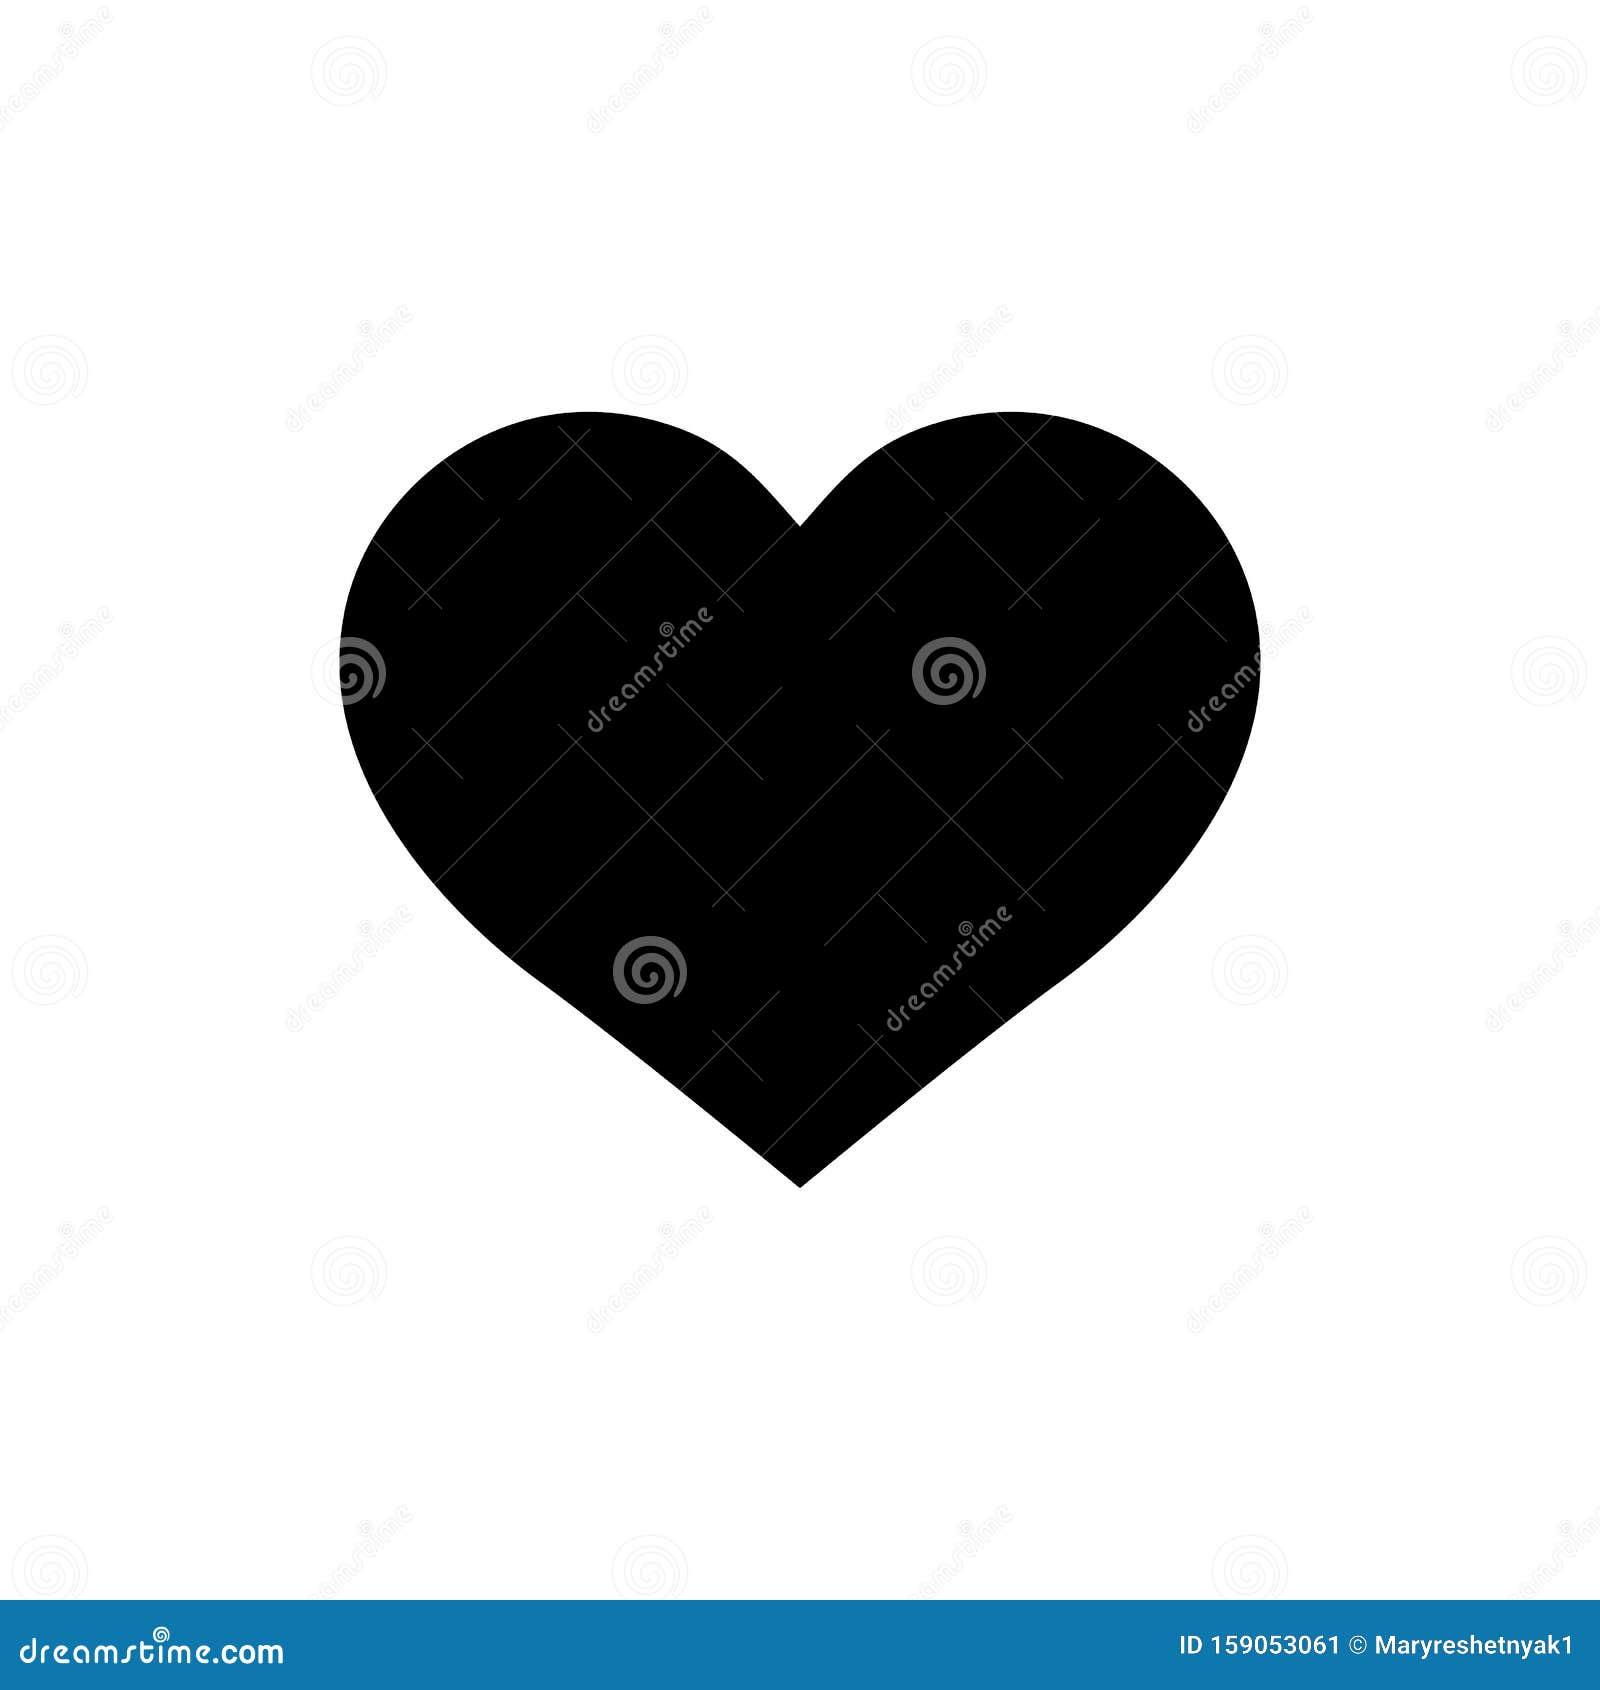 Black heart shape on isolated background.Like icon. Social media icon wirh heart. vector illustration